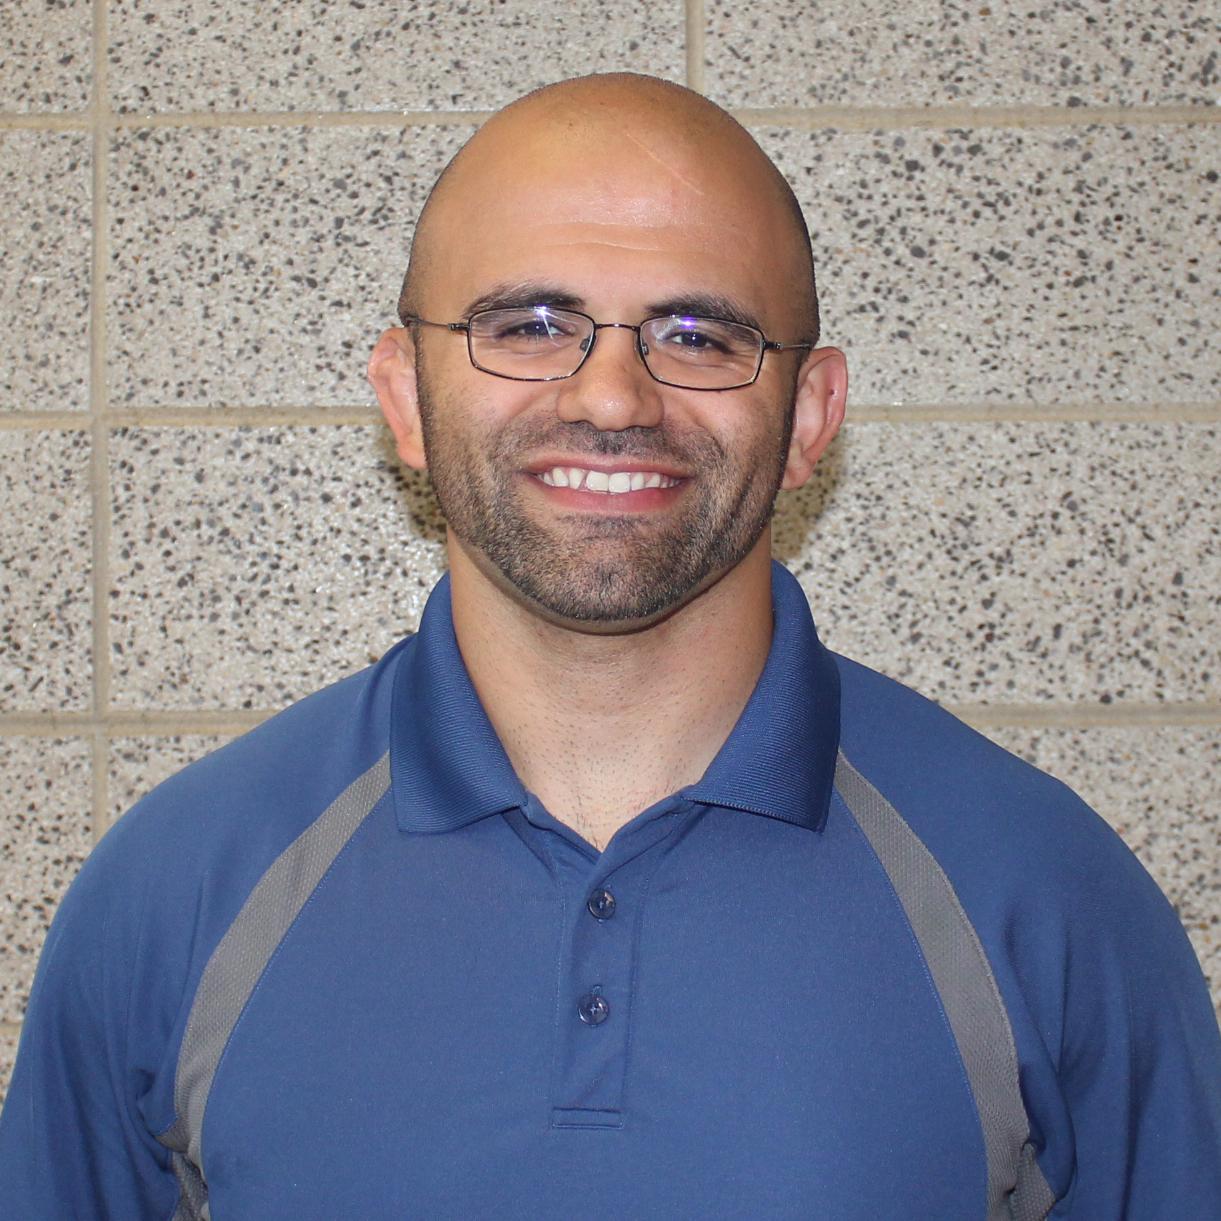 New Dean, Mr. Babakhani